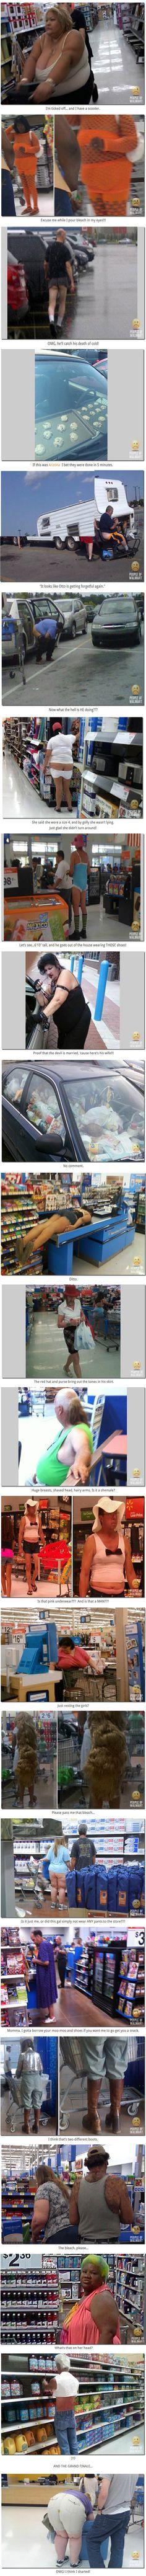 The Best (or Worst?) of the People of Walmart - Part 4   Boo Fckm HooBoo Fckm Hoo